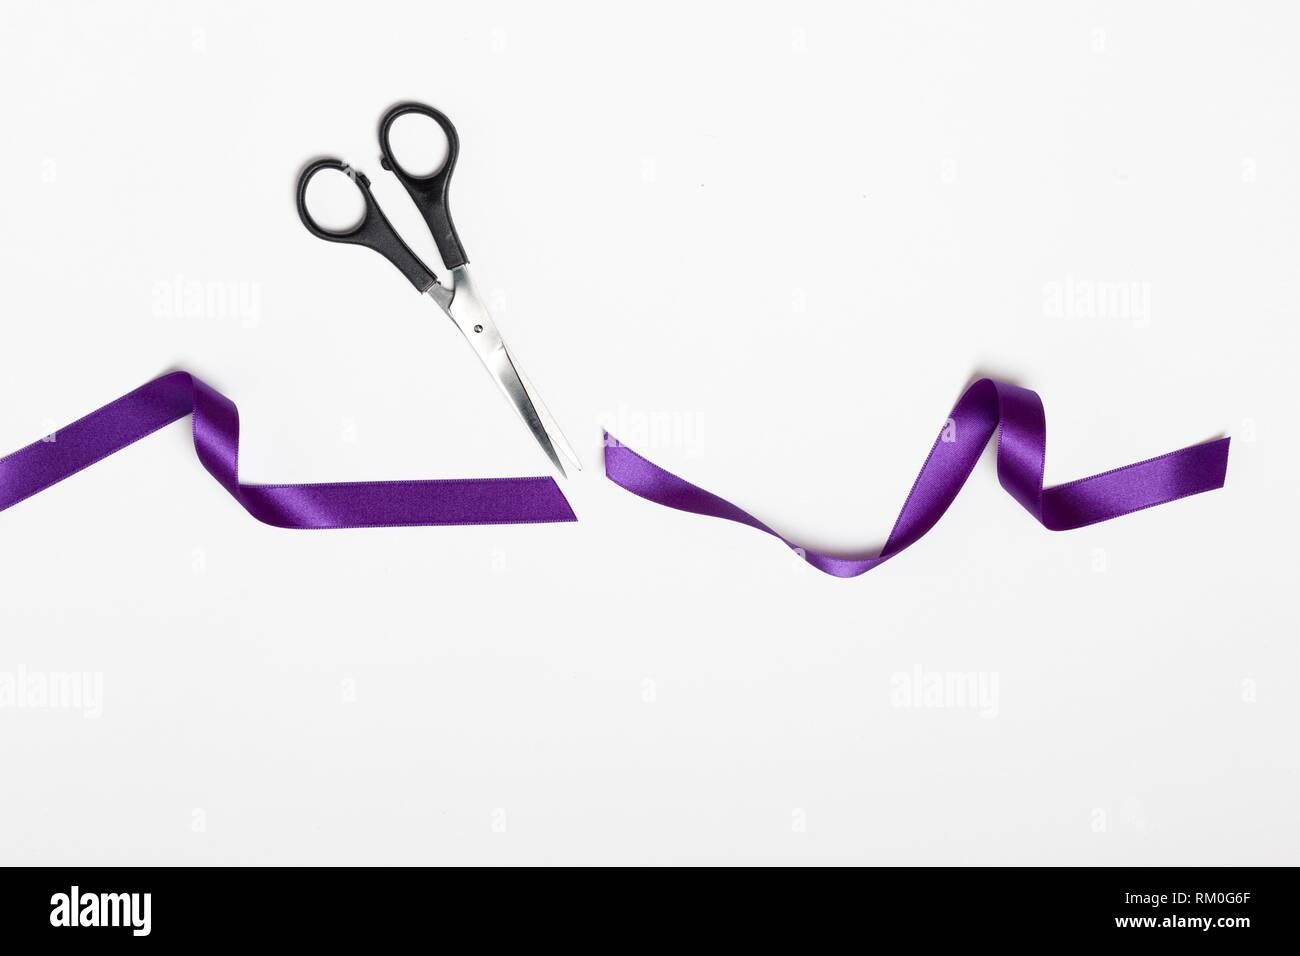 scissors cutting symbol feminism violet fabric ribbon on white background - Stock Image